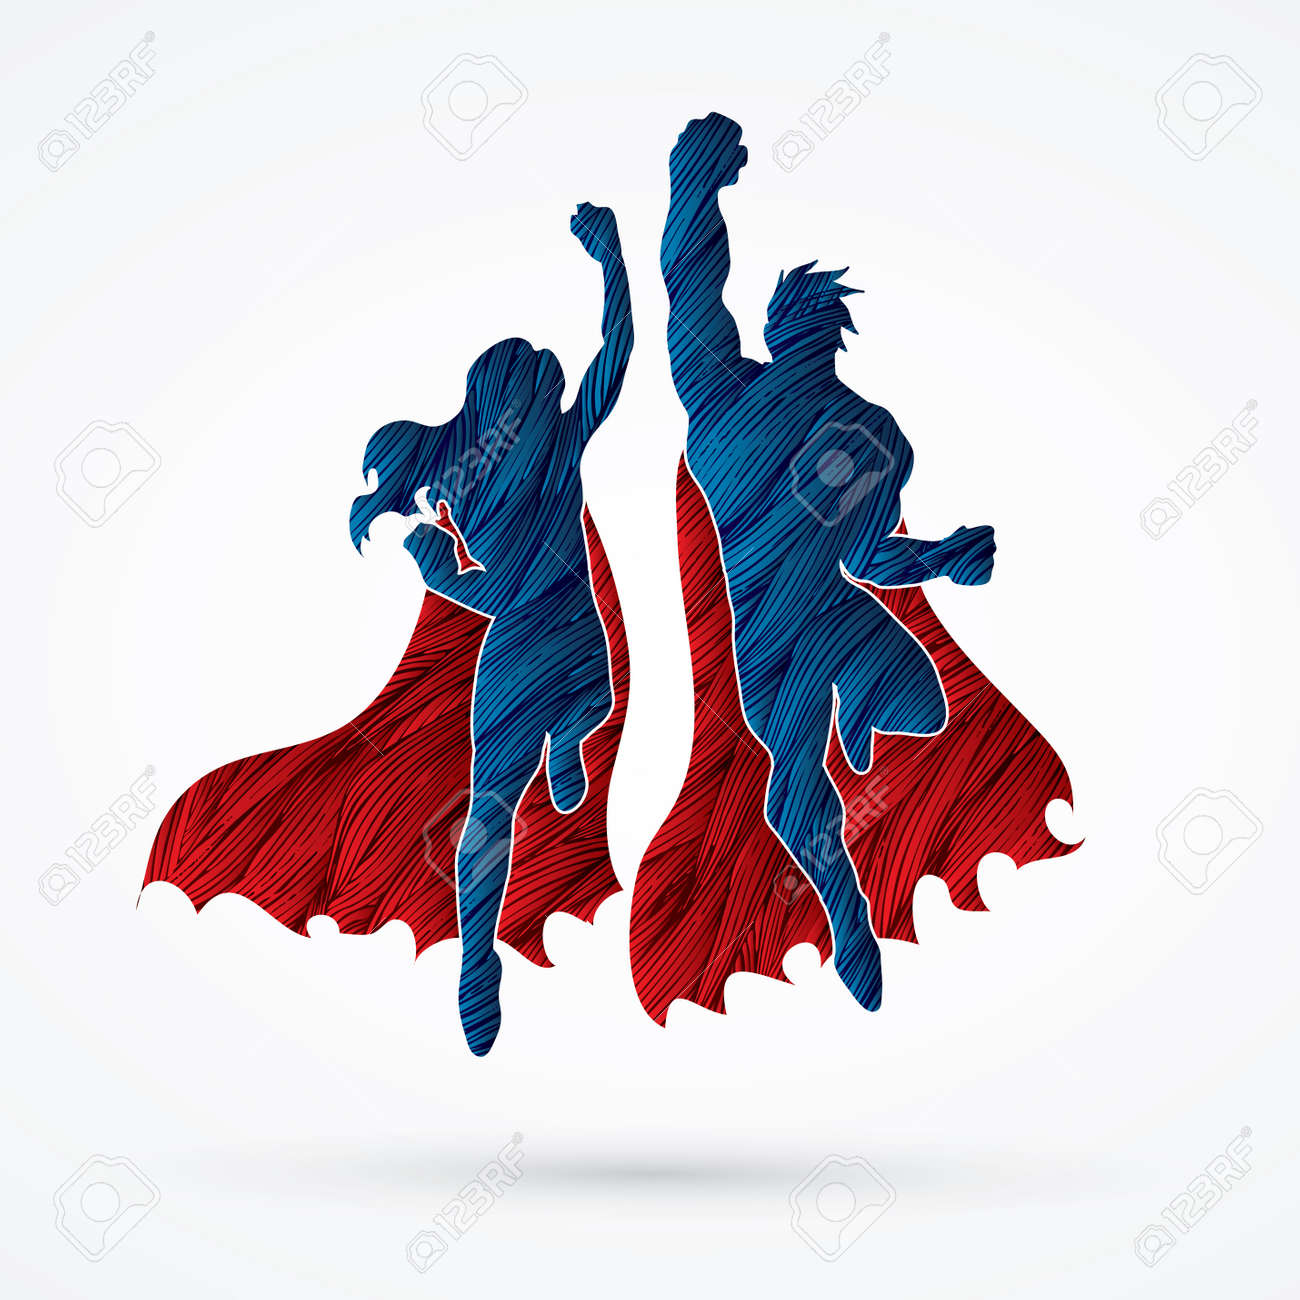 Superhero Man and Woman jumping designed using grunge brush graphic vector. - 60393747